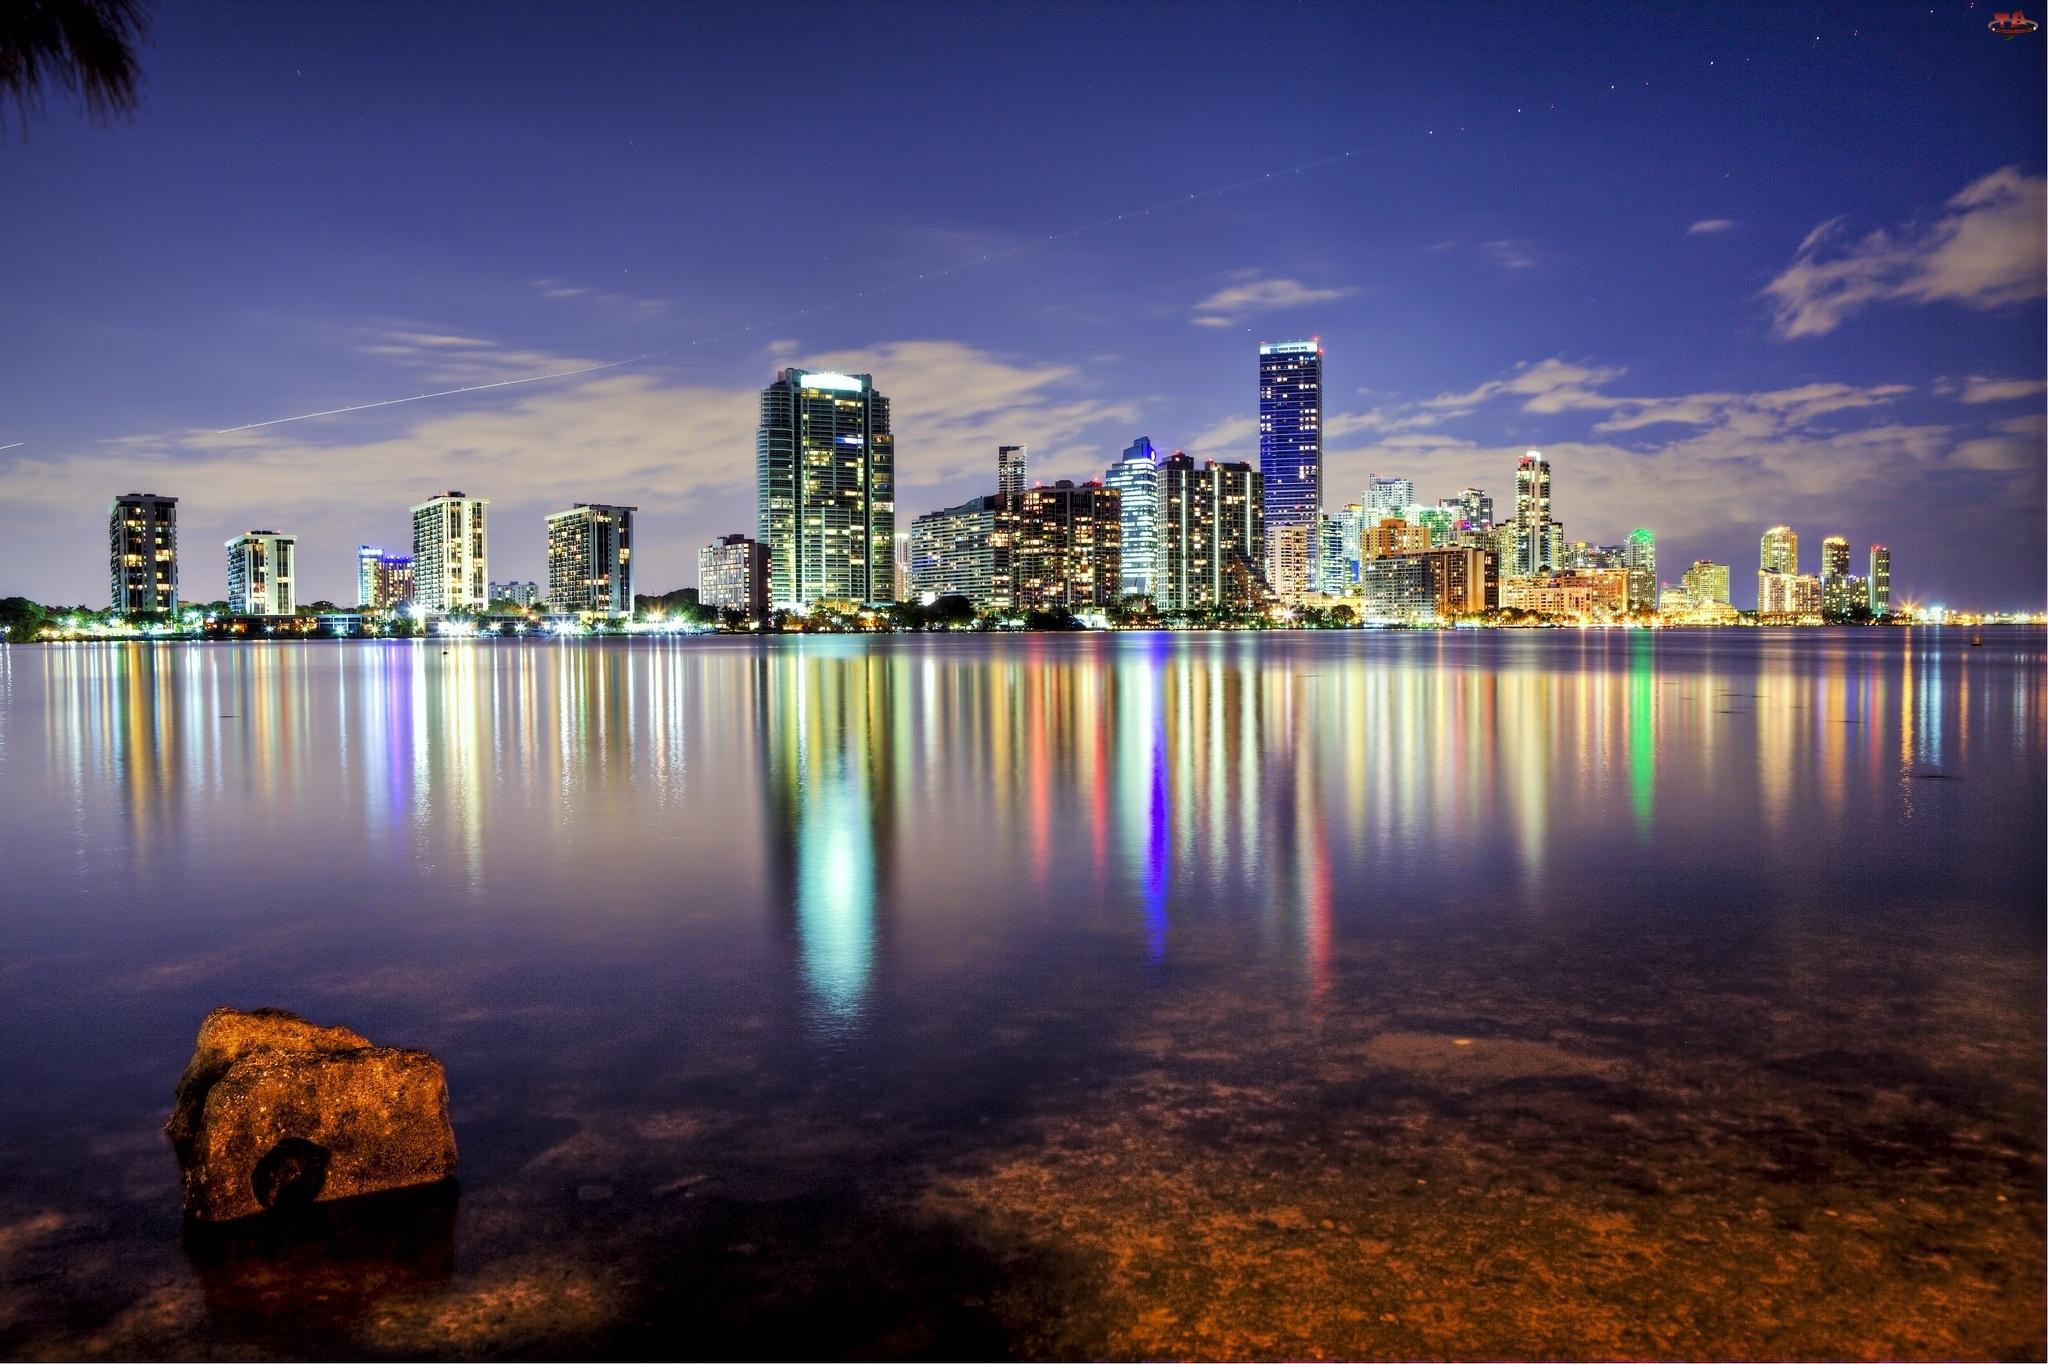 Floryda, Drapacze, Ocean, Chmur, Majami